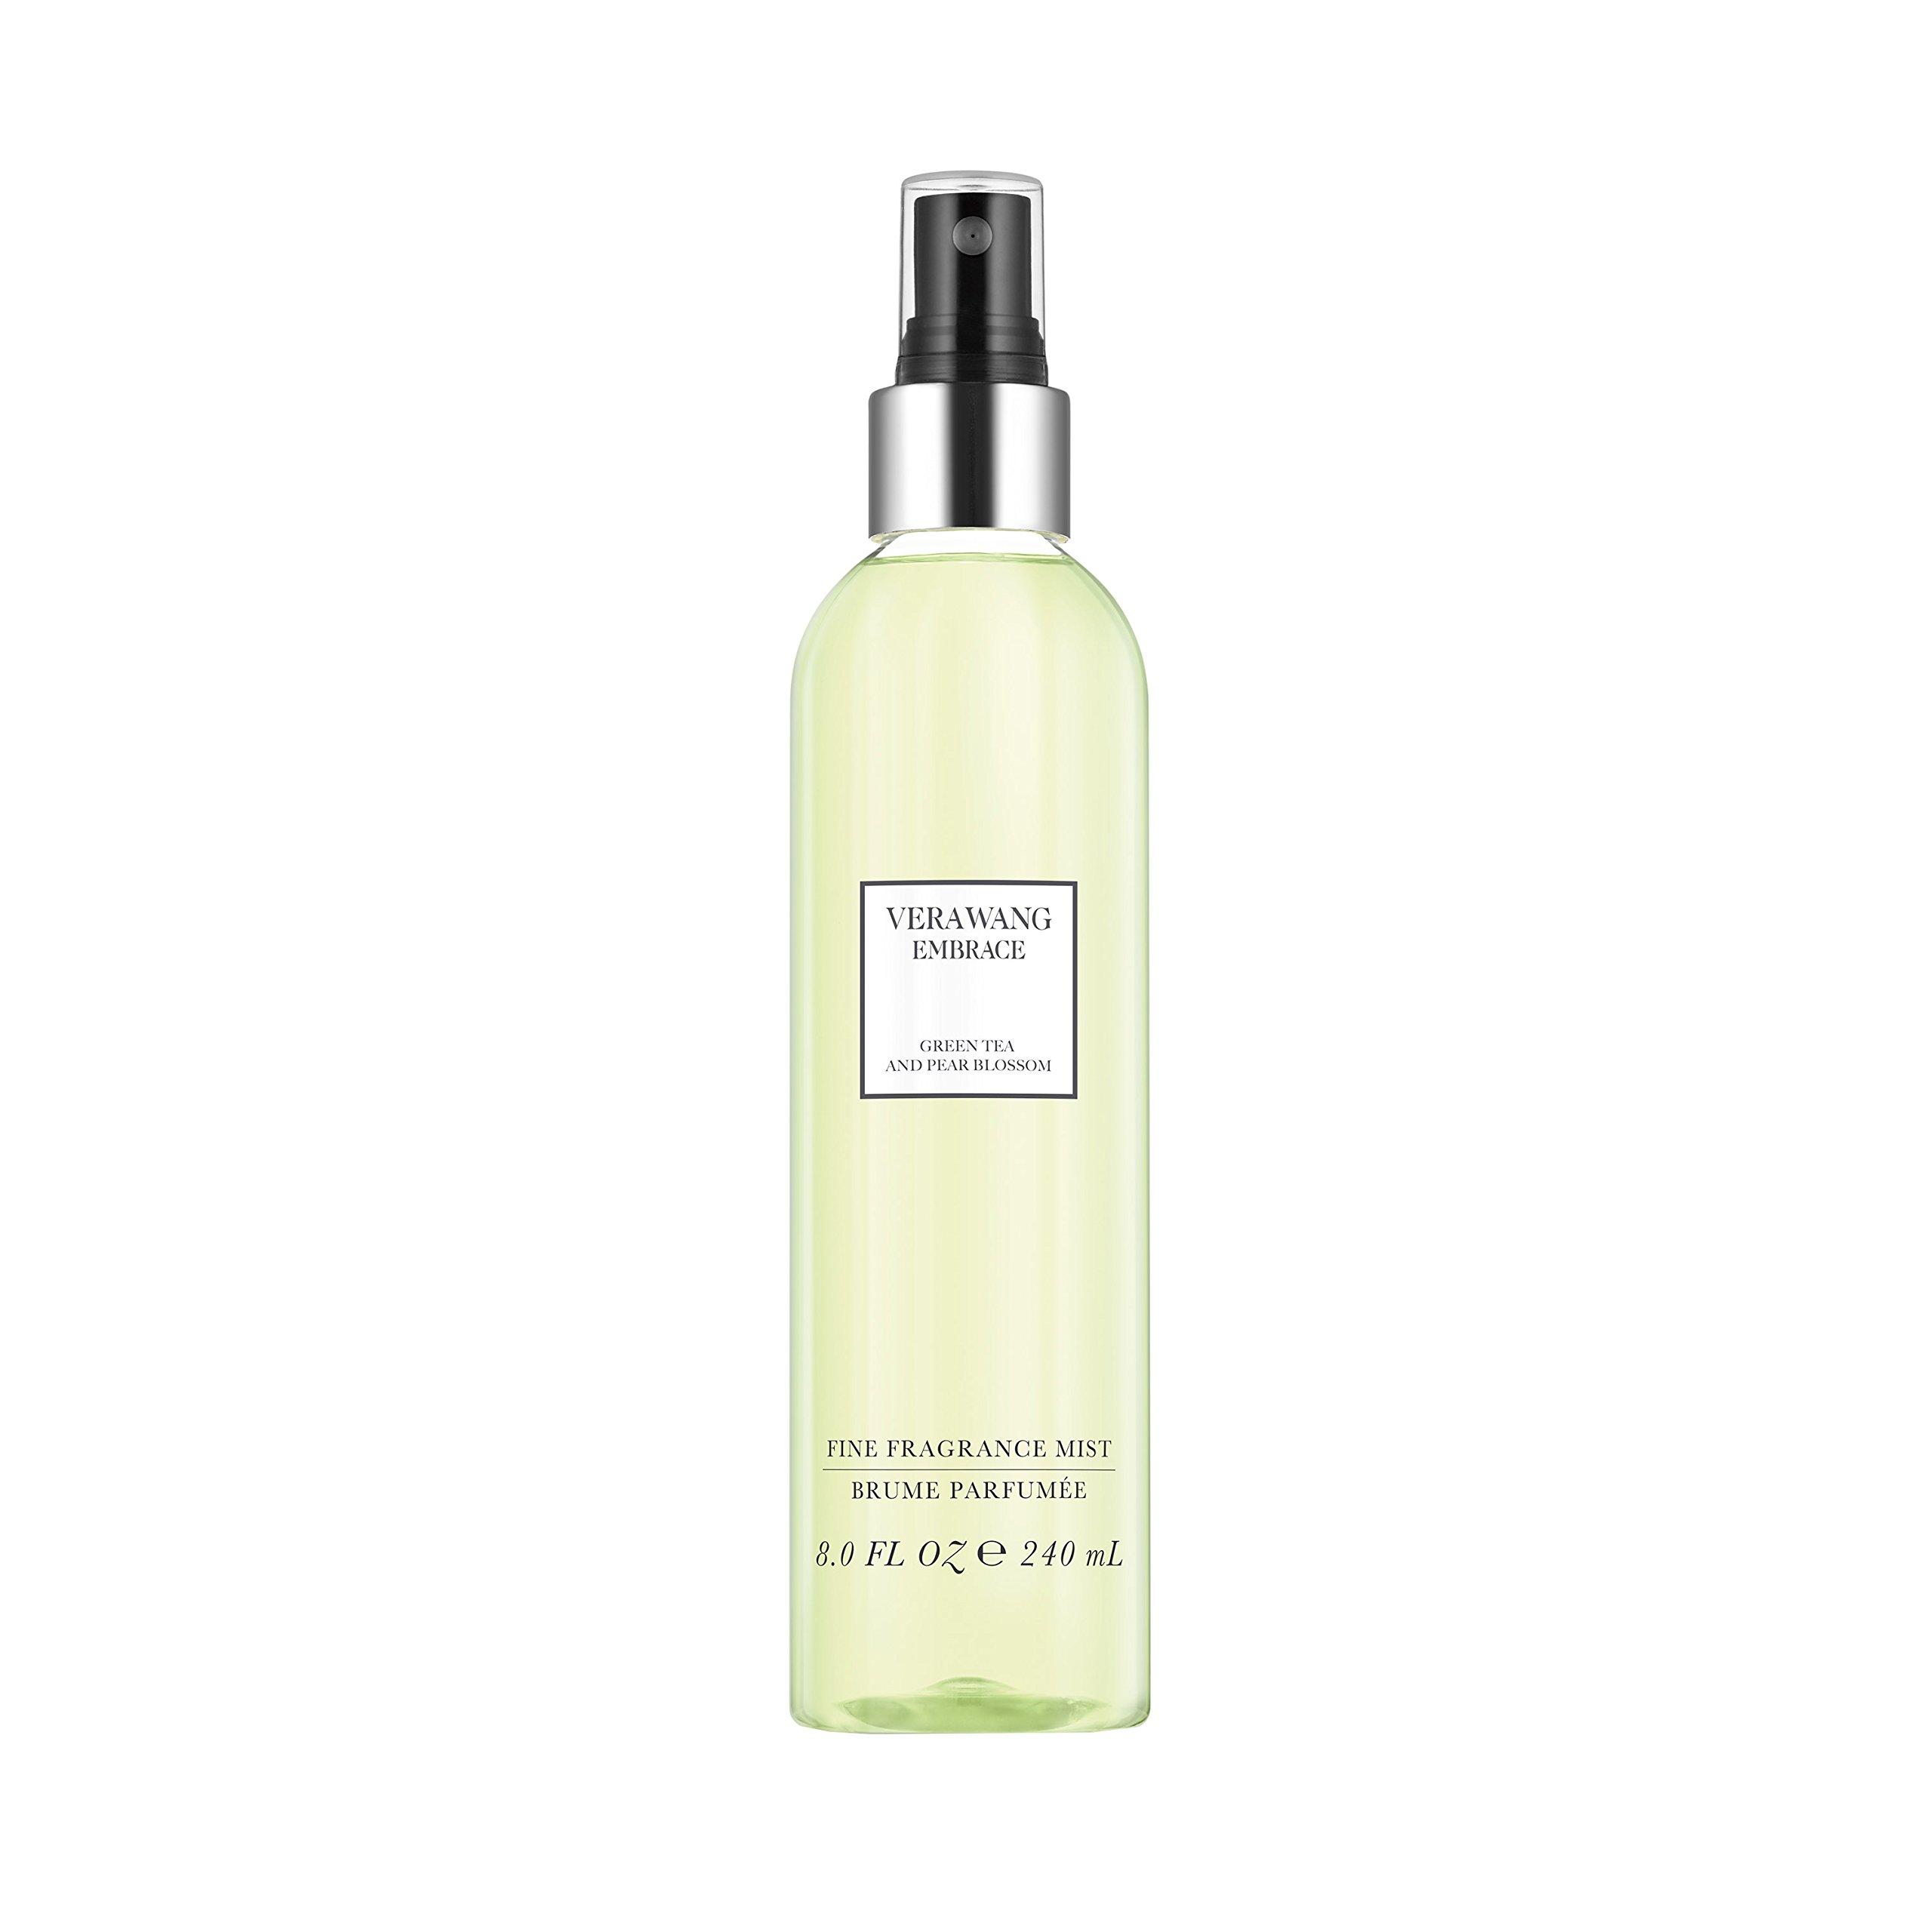 Vera Wang Embrace Body Mist for Women Green Tea and Pear Blossom Scent 8 Fluid Oz. Body Mist Spray. Bright, Modern, Classic Fragrance